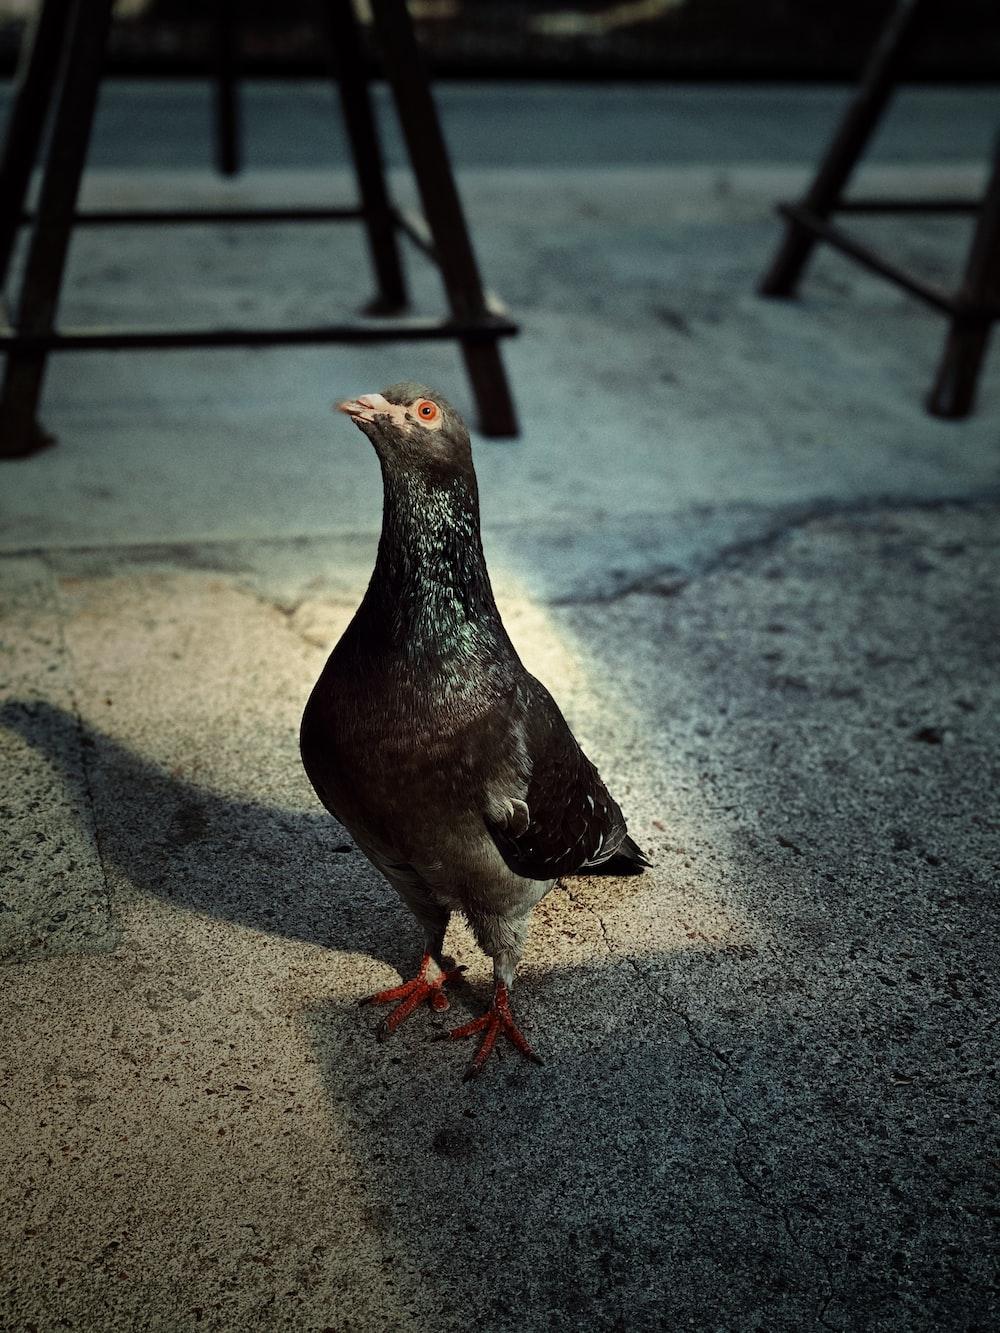 black and white duck on gray concrete floor